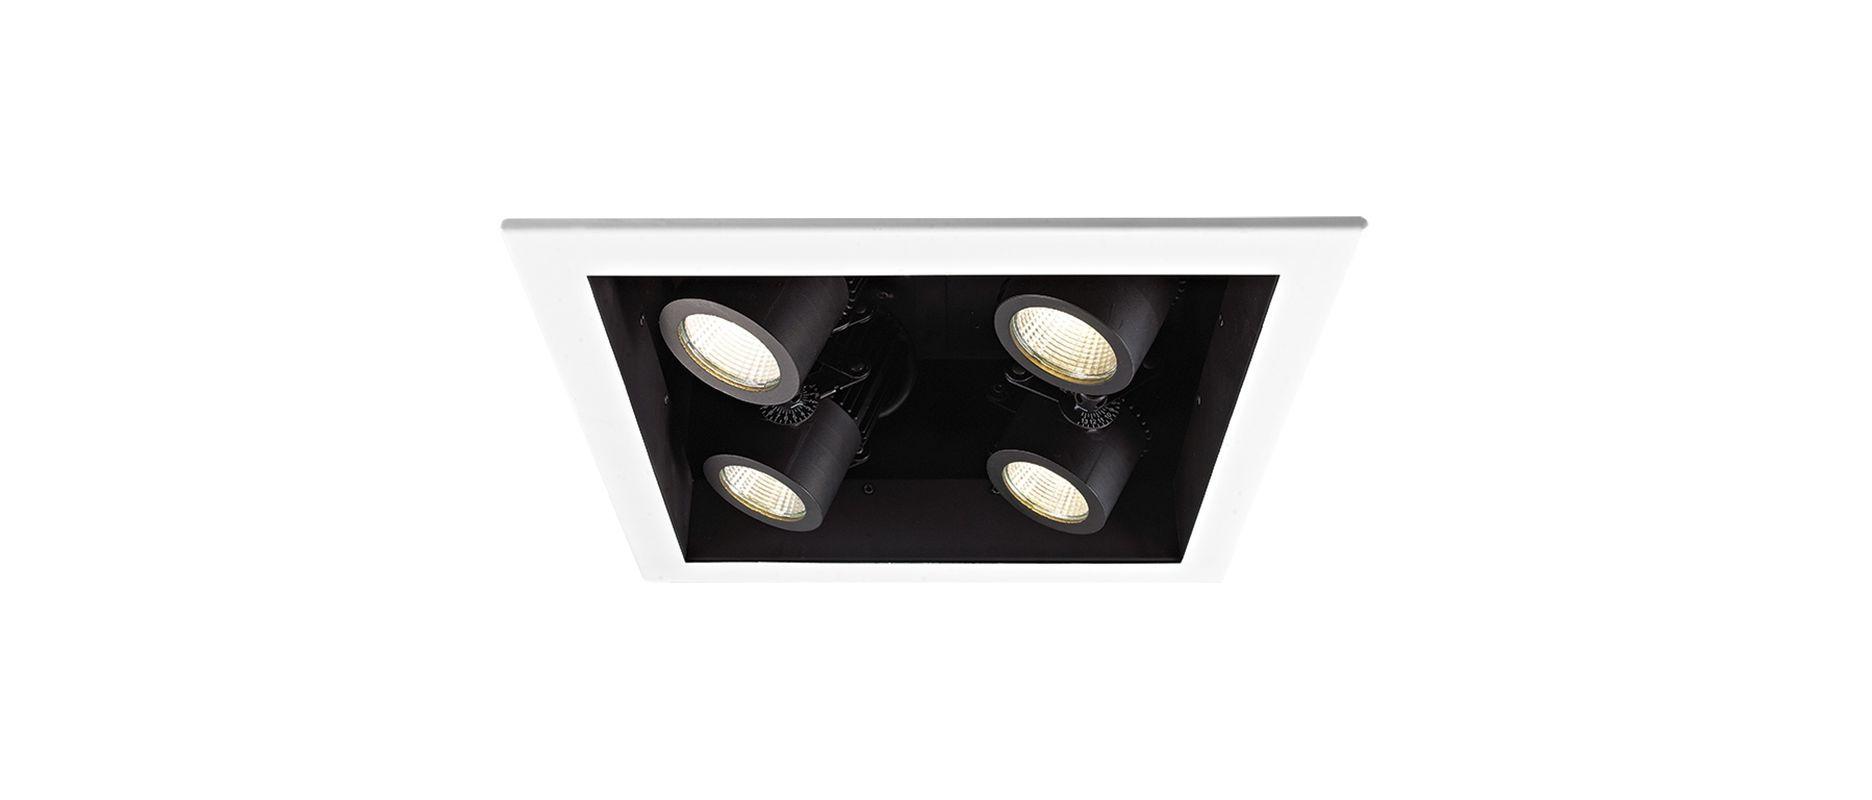 WAC Lighting MT-4LD226N-F27 4 Light Energy Star 2700K High Output LED